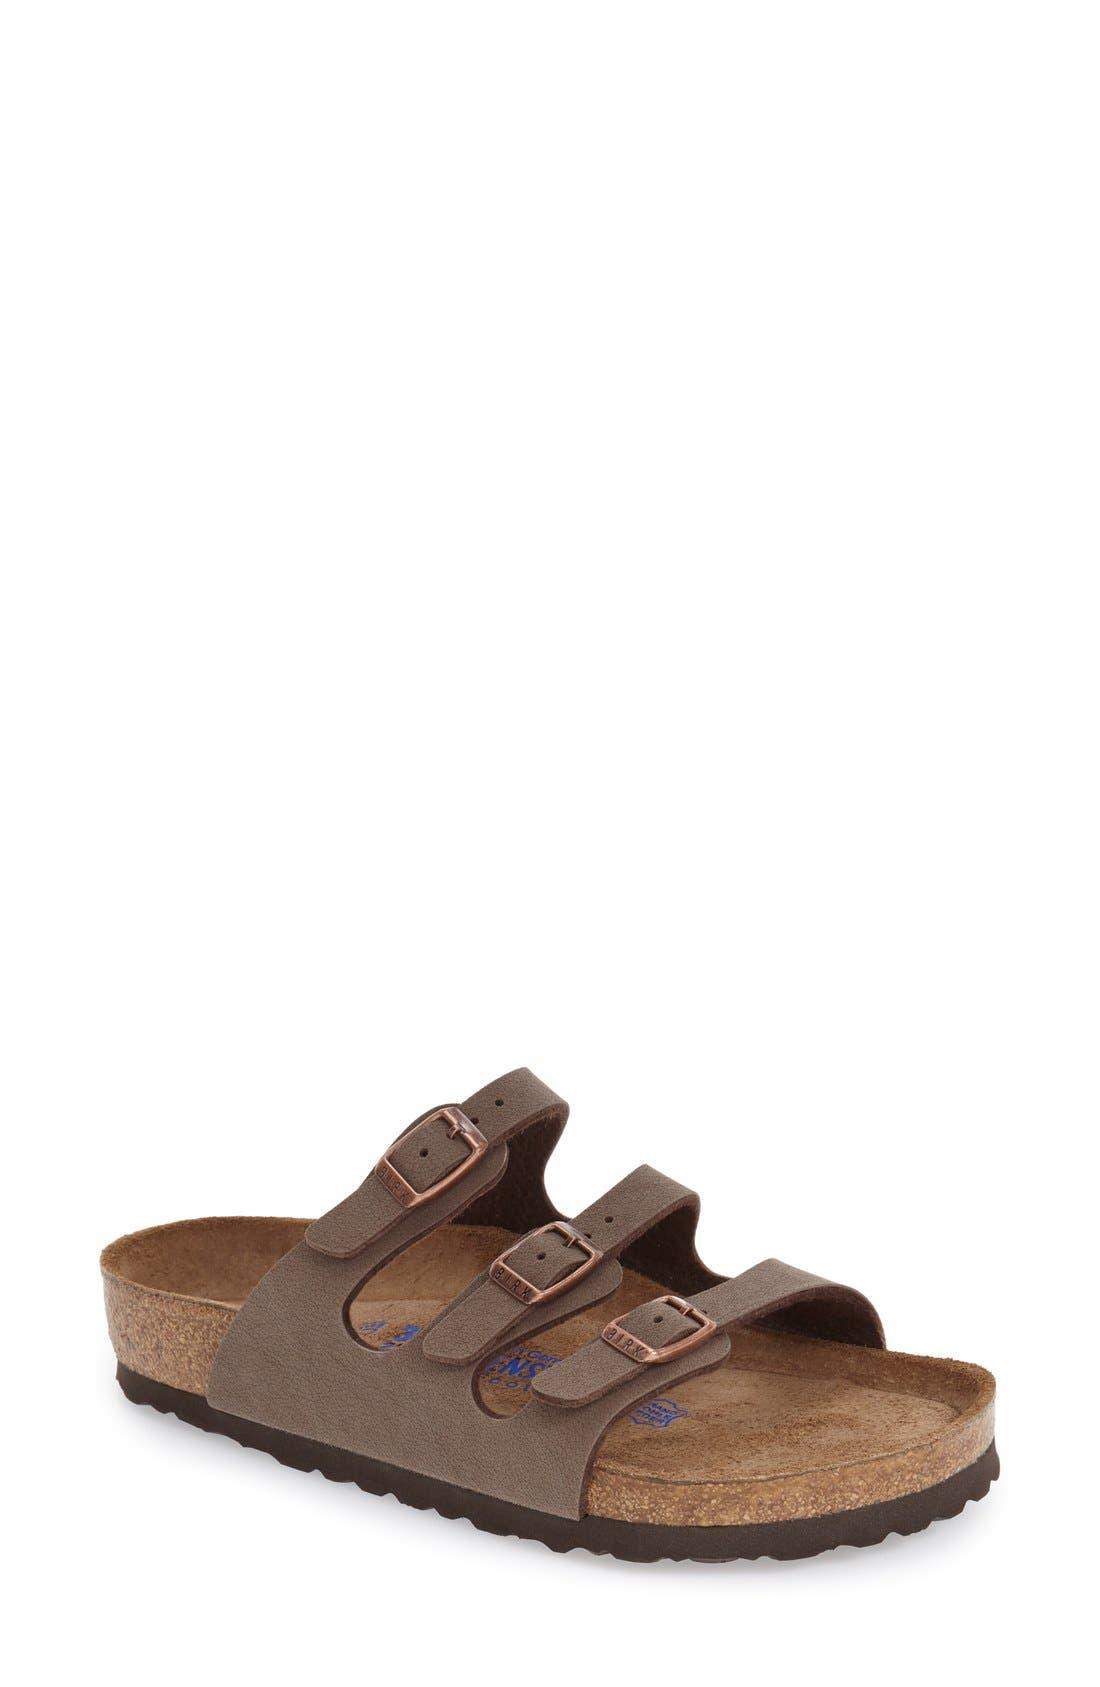 Main Image - Birkenstock 'Florida Birkibuc' Soft Footbed Sandal (Women)